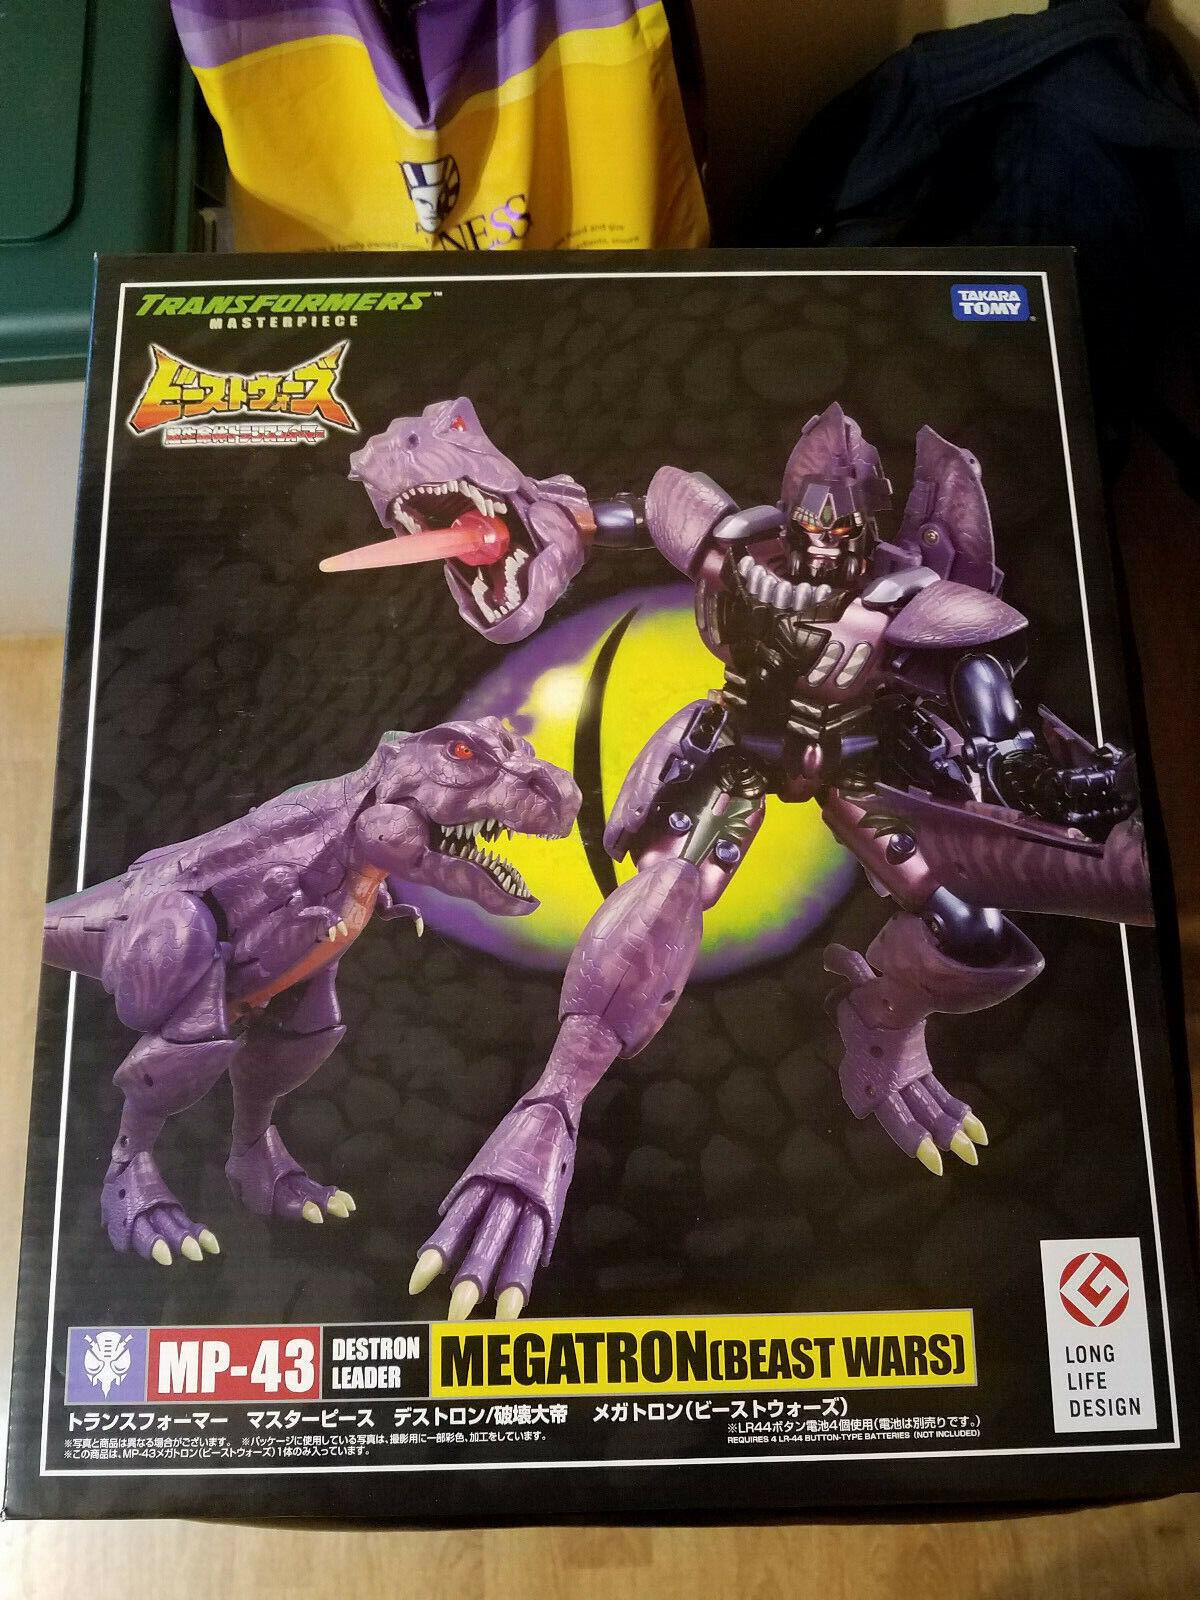 Transformers Takara Masterpiece MP-43 MEGATRON Beast Wars Destron Leader MISB